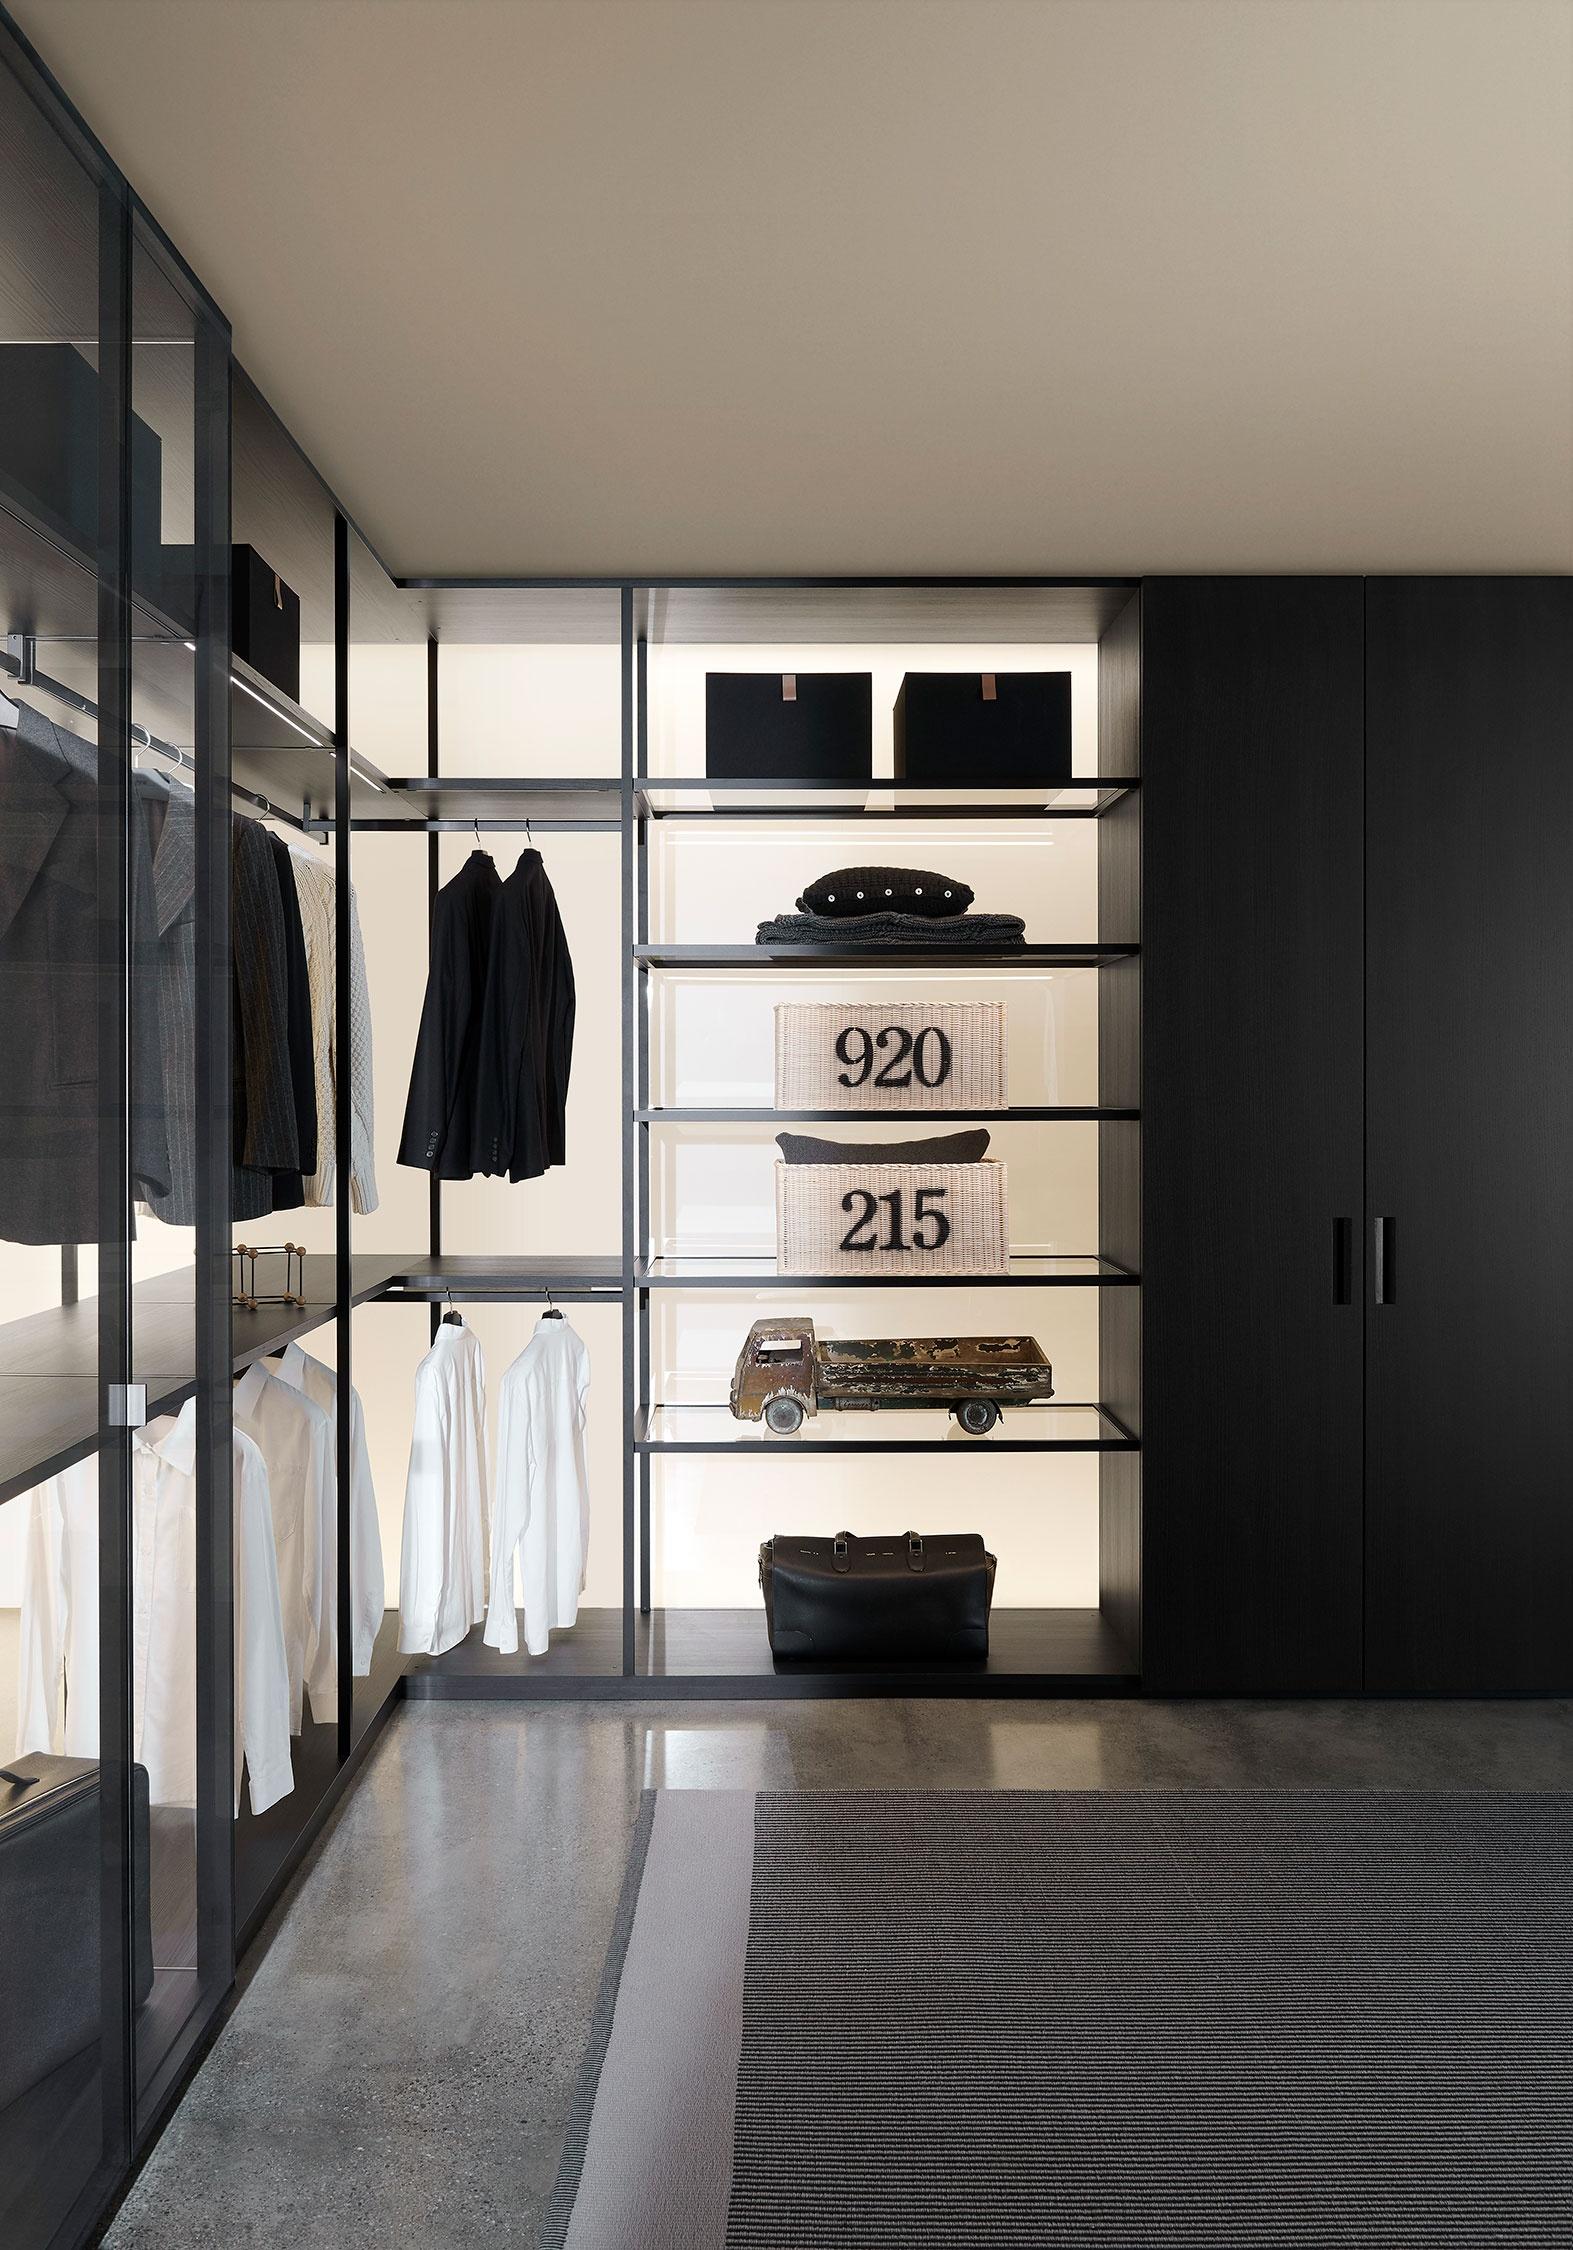 Porro, image:STORAGE black sugi, designed by: Piero Lissoni + CRS -